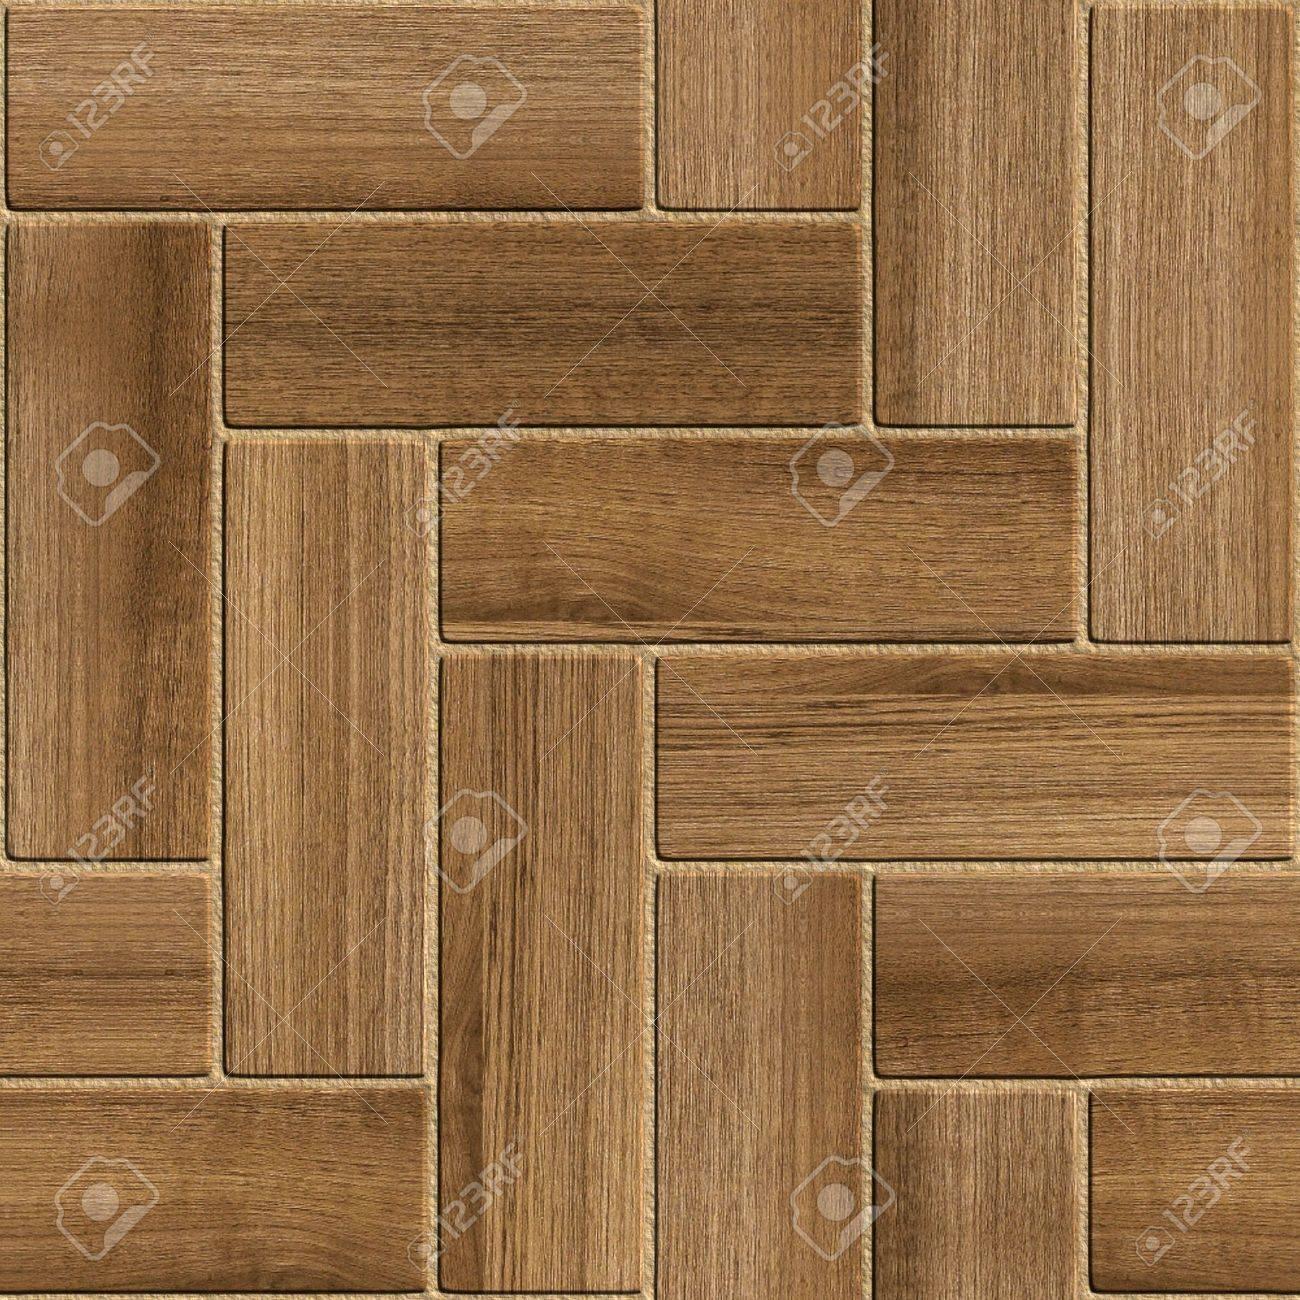 Seamless wooden parquet floor Stock Photo - 9164977 - Seamless Wooden Parquet Floor Stock Photo, Picture And Royalty